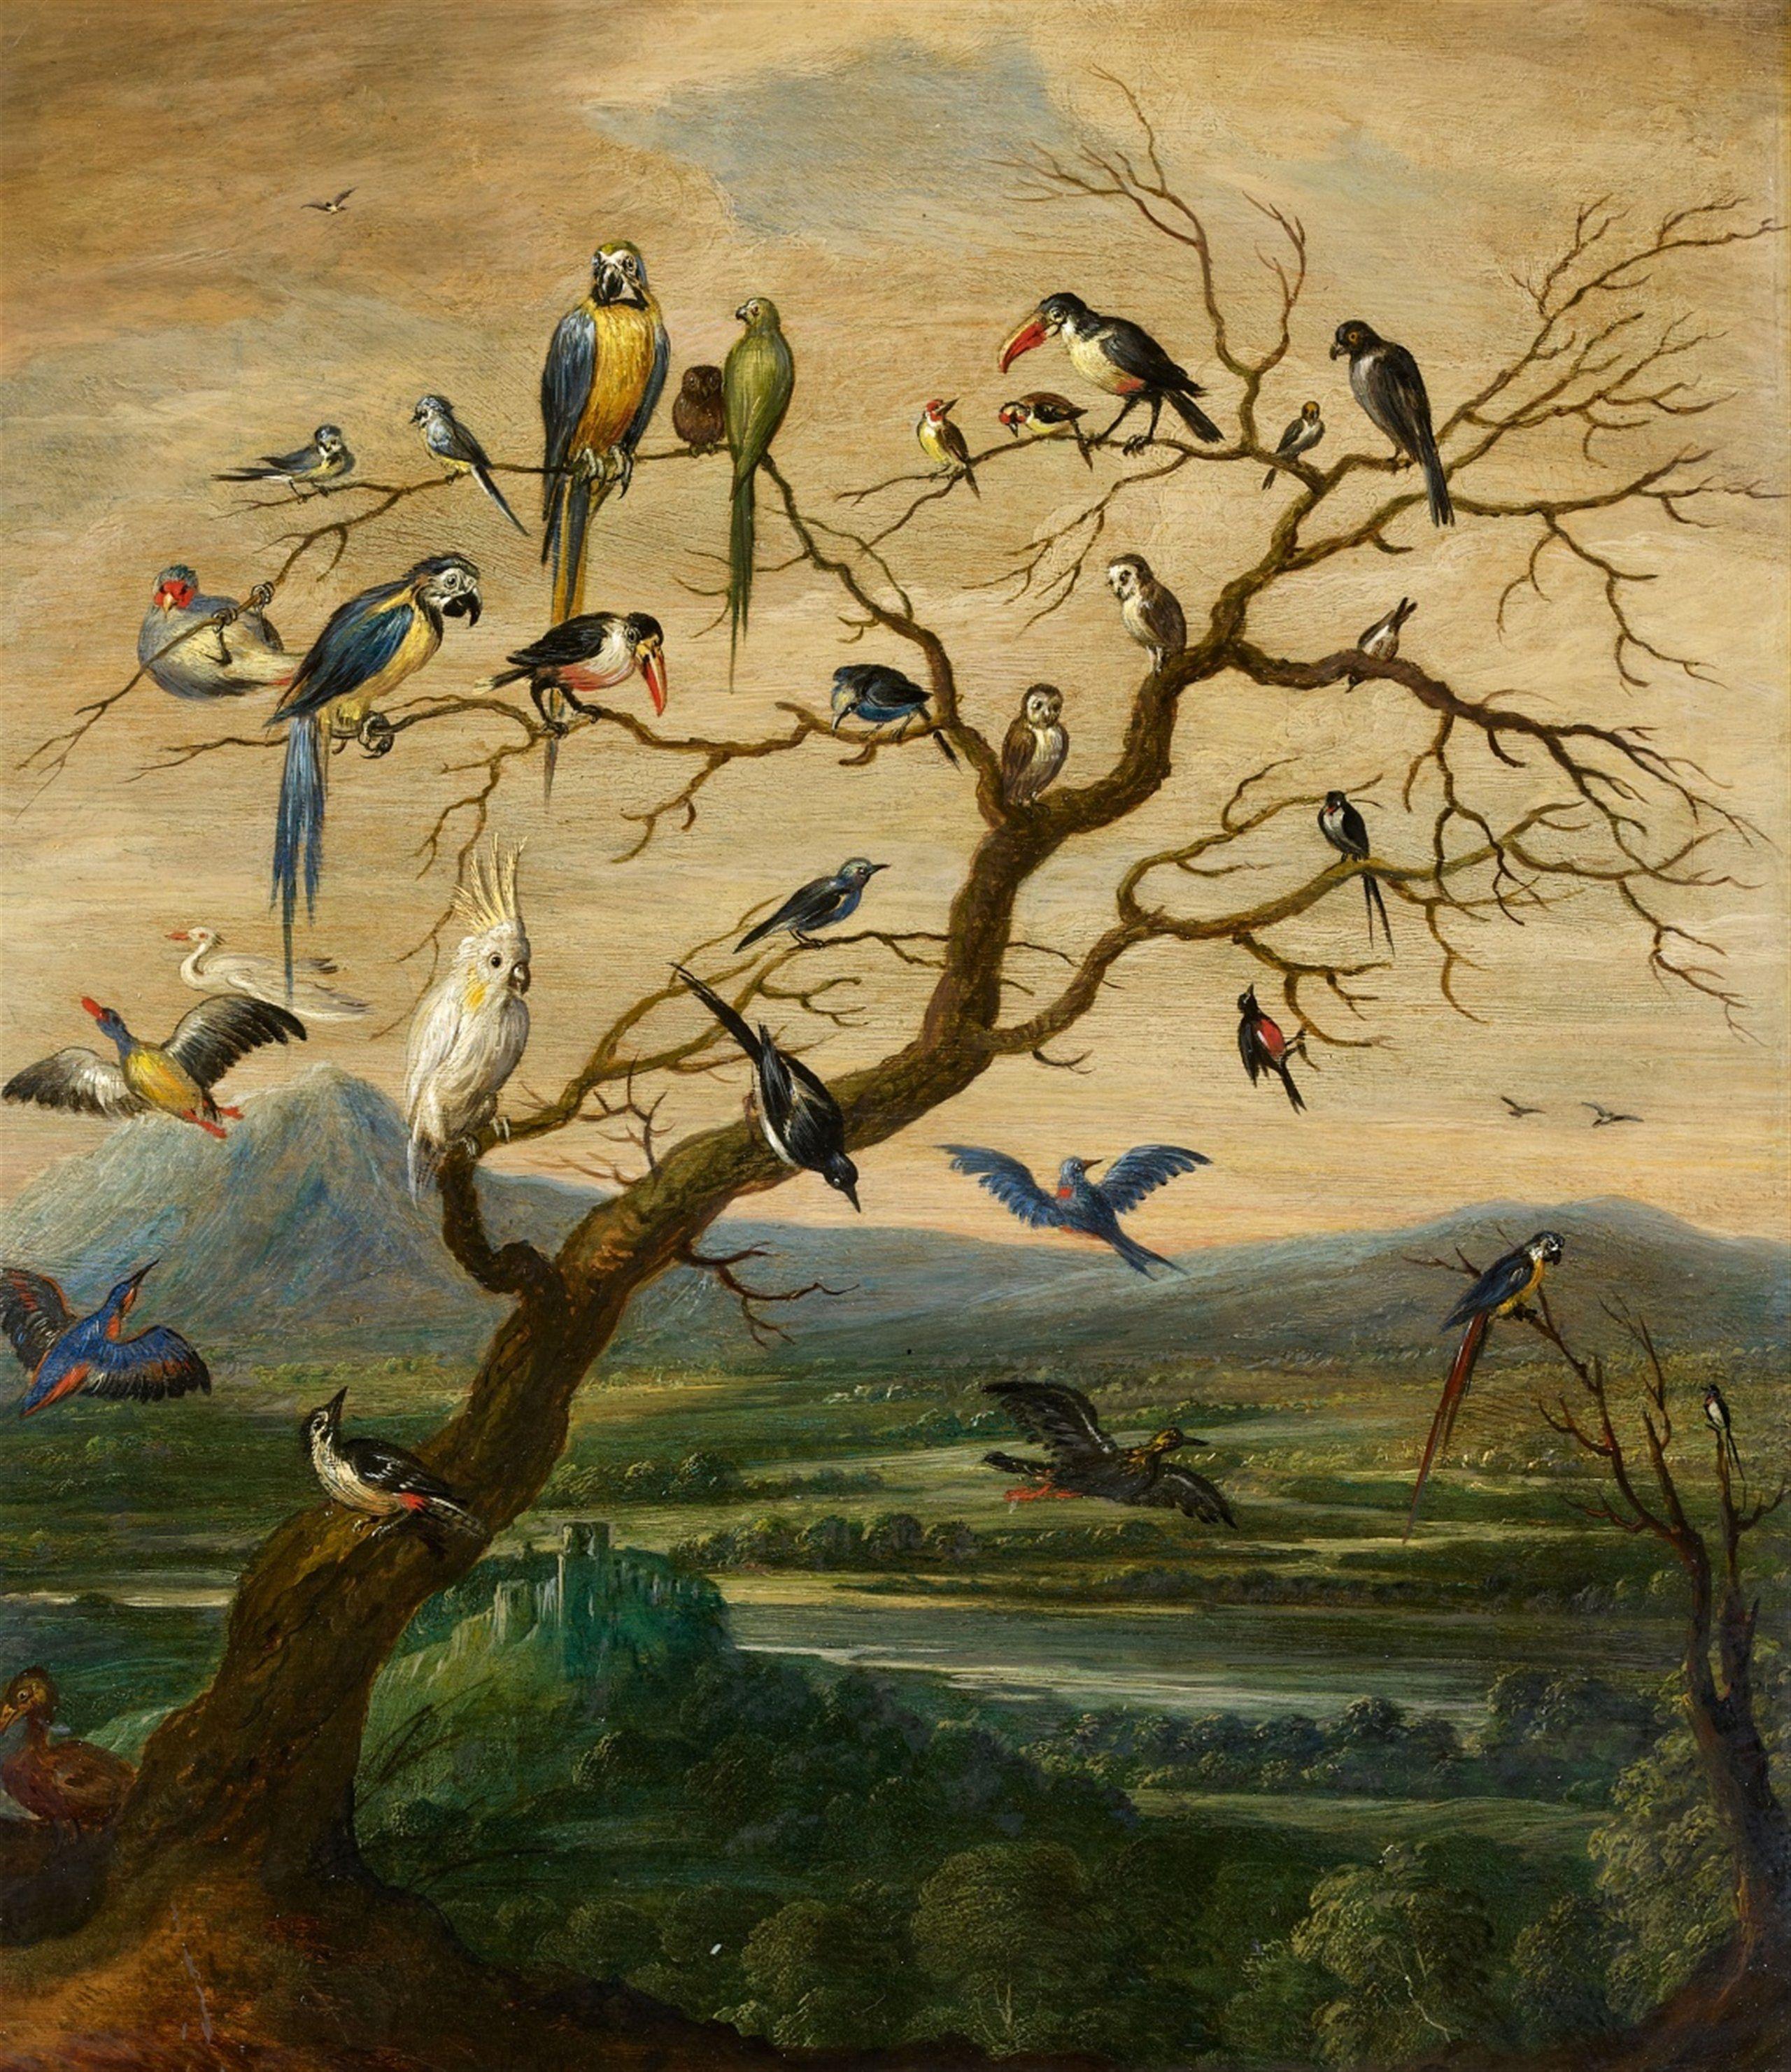 Flemish School, 17th century, Birds in a Tree before a Landscape, Oil on panel (parquetted). 41 x 36.5 cm. | Bird art, Tree illustration, Animal art